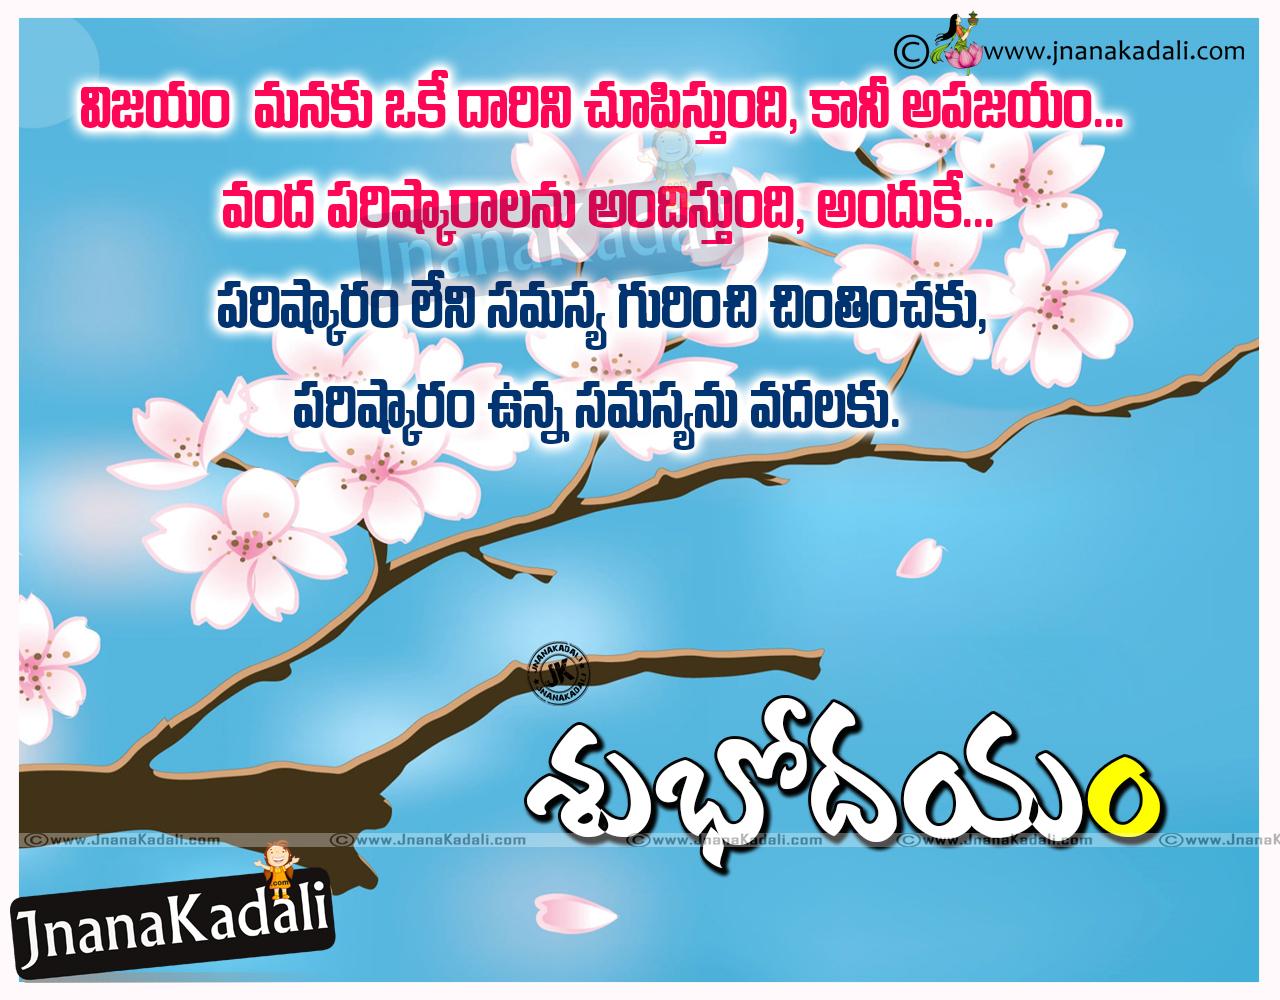 Telugu New Good Morning Greetings With Quotes Jnana Kadali